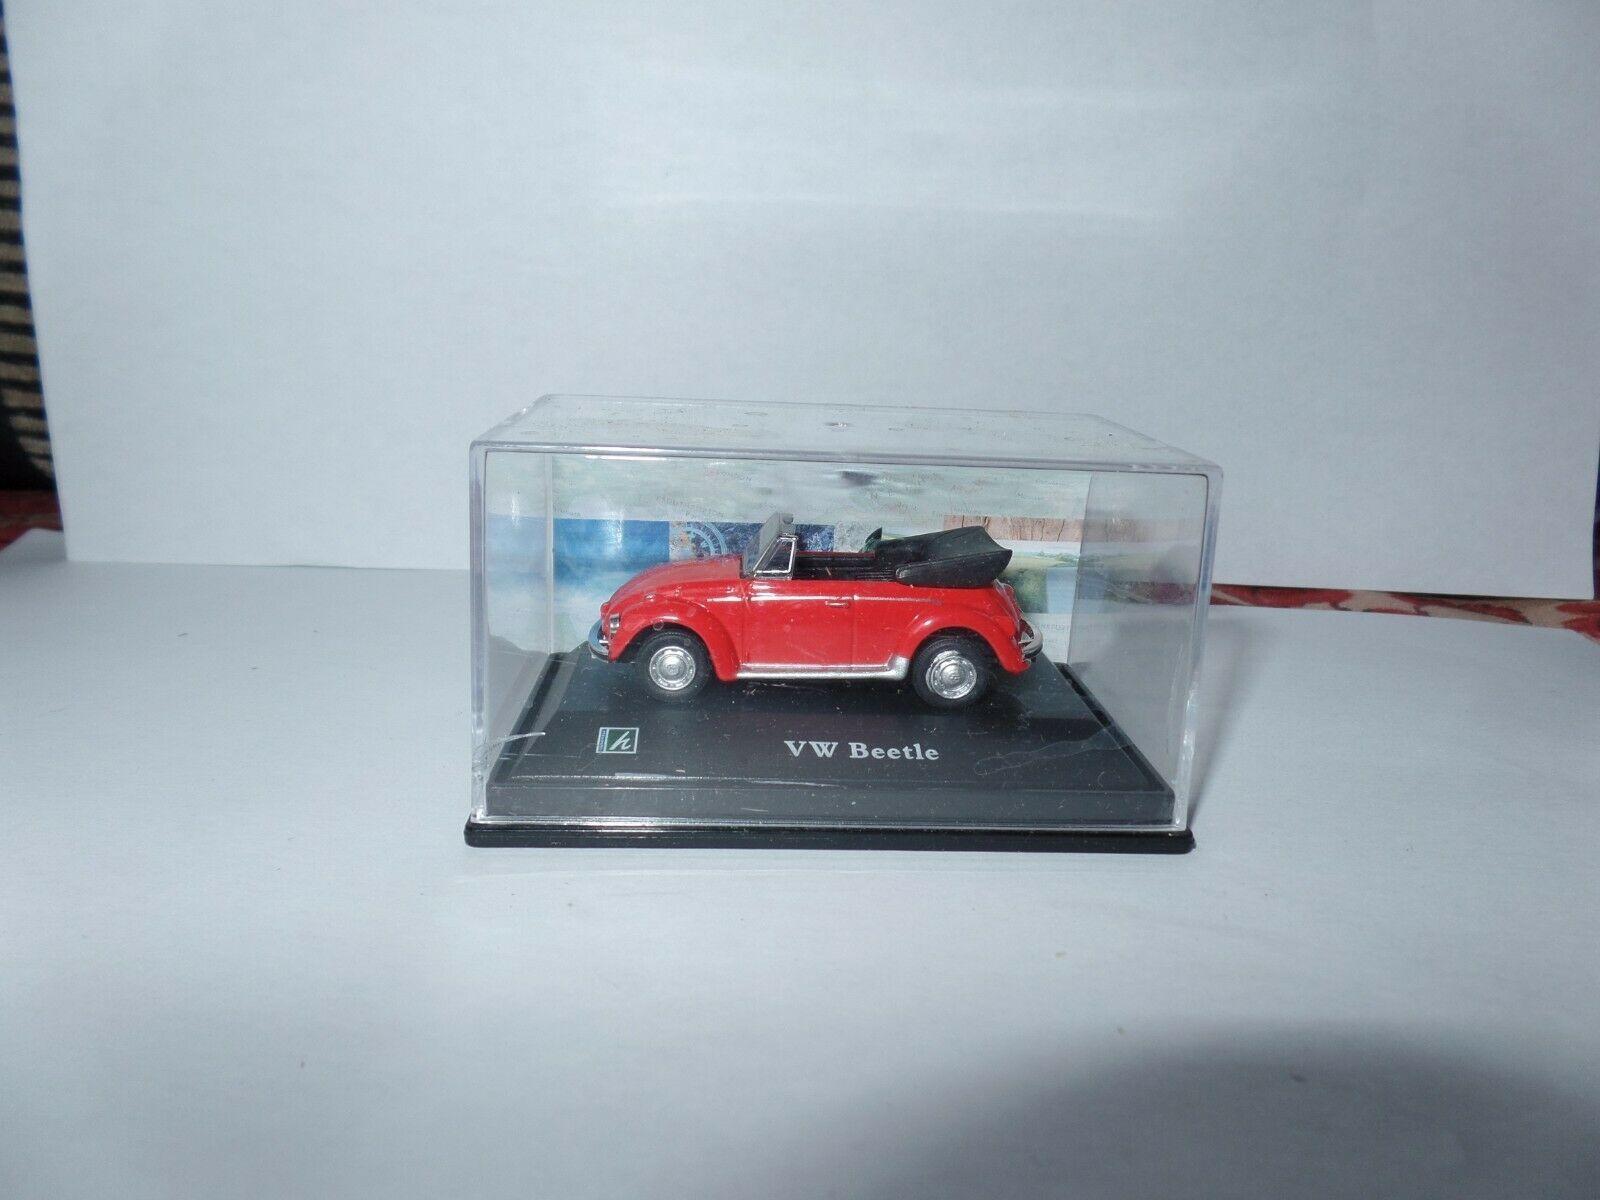 Cararama 1 72 Scale Volkswagen Vw Beetle Red Convertible Open Top